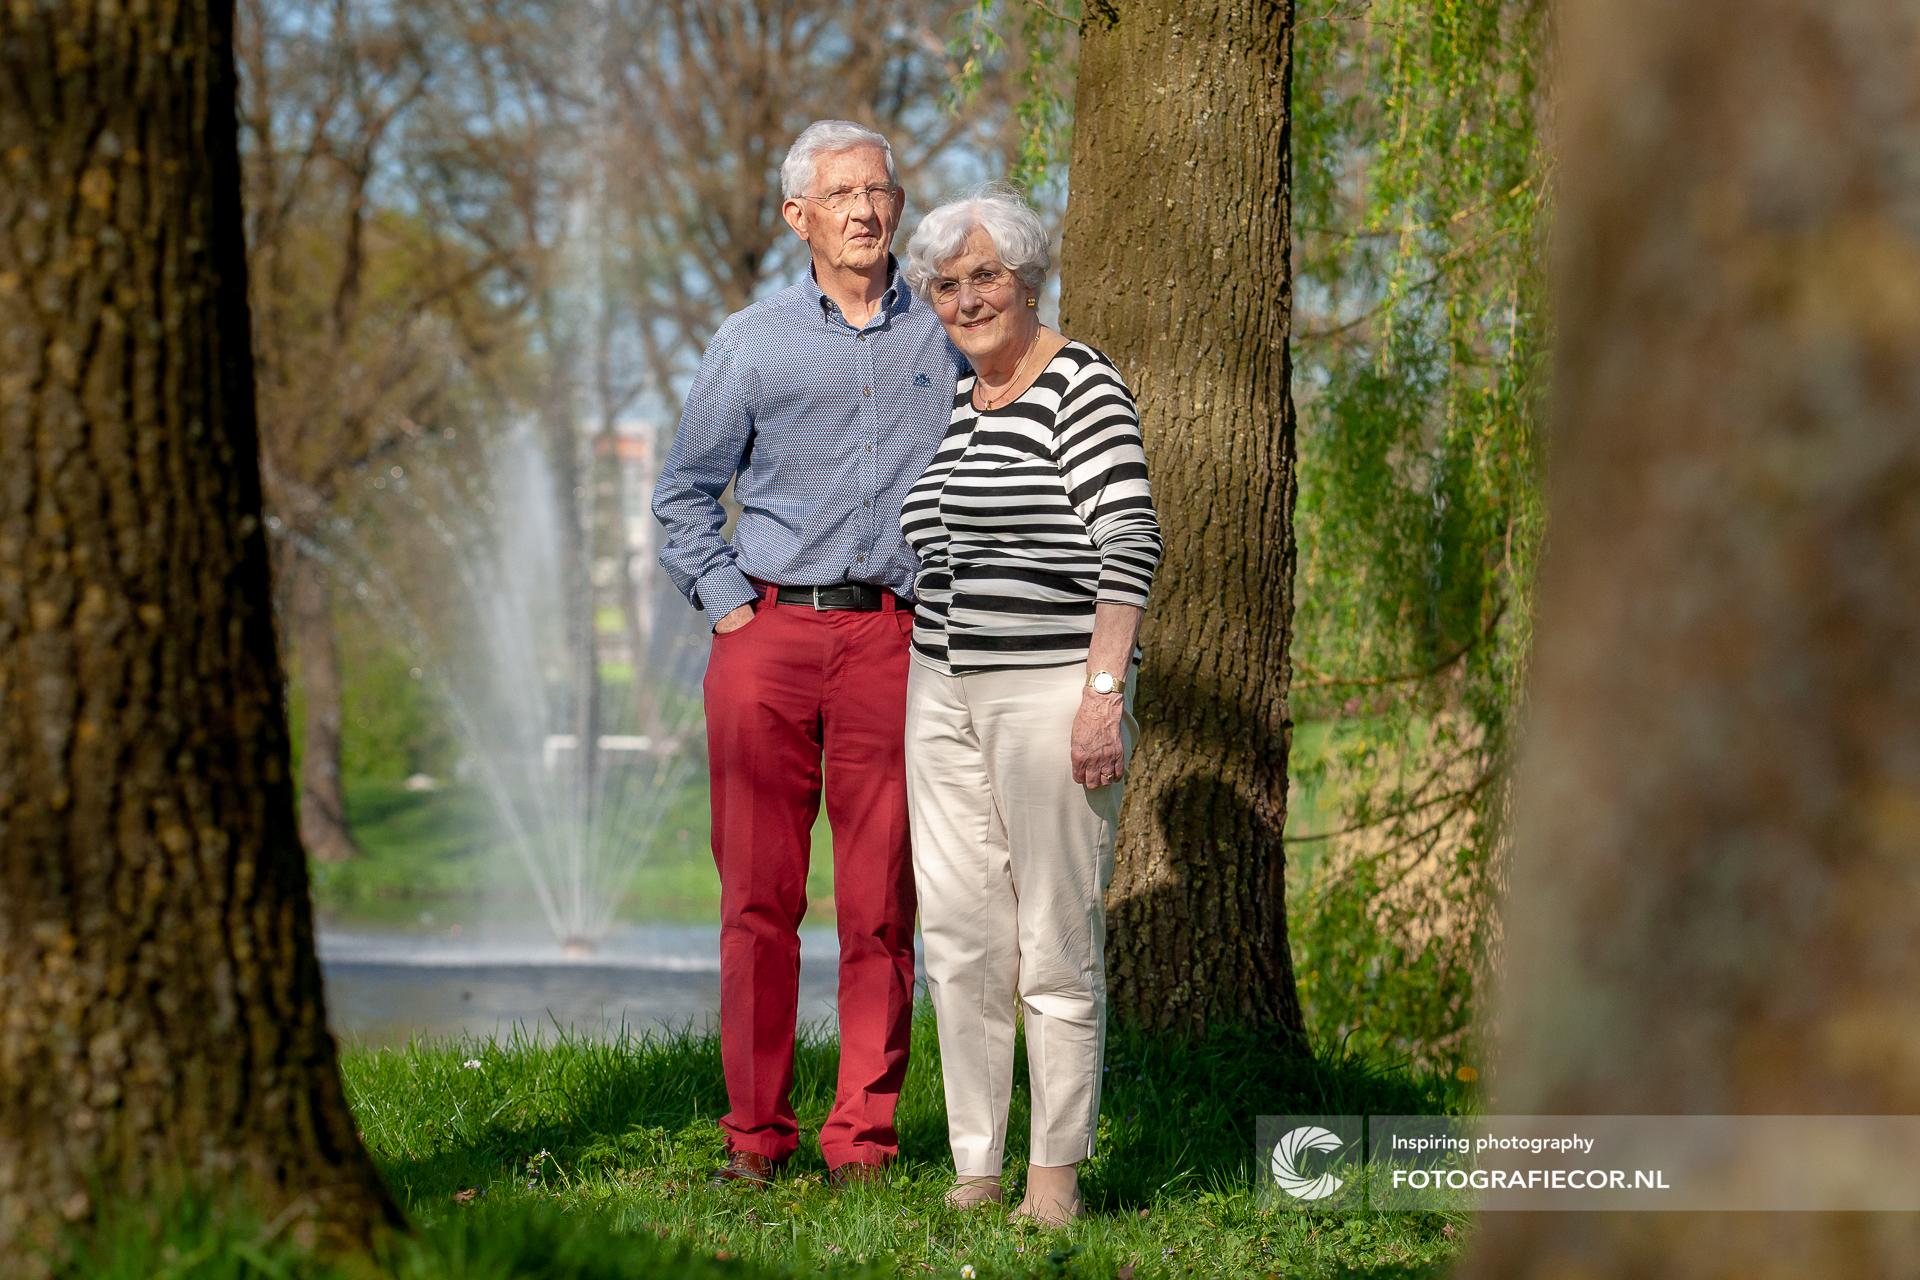 familie fotoshoot op locatie | portretfotografie | opa & oma | familiefoto | fotograaf Kampen